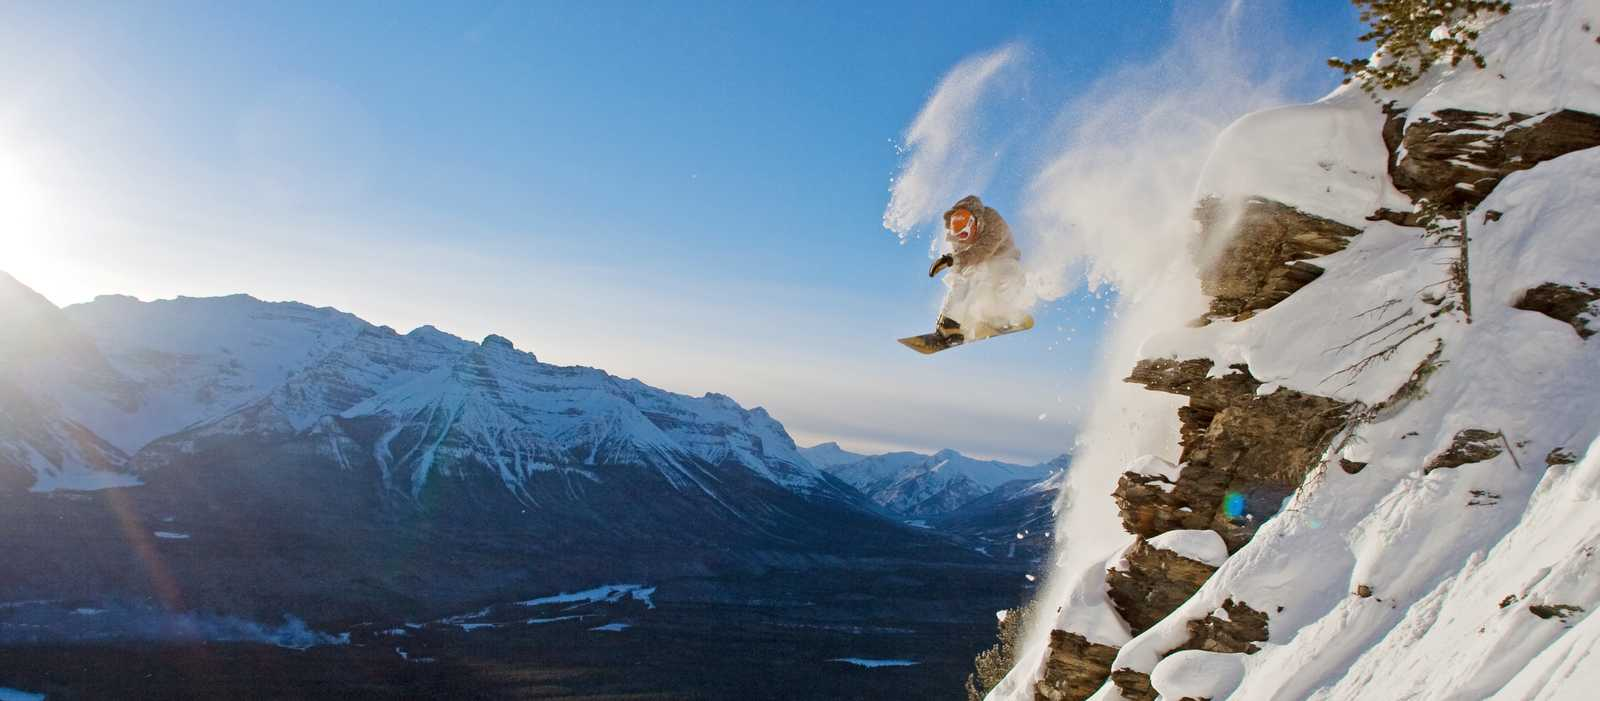 Extrem-Snowboarding